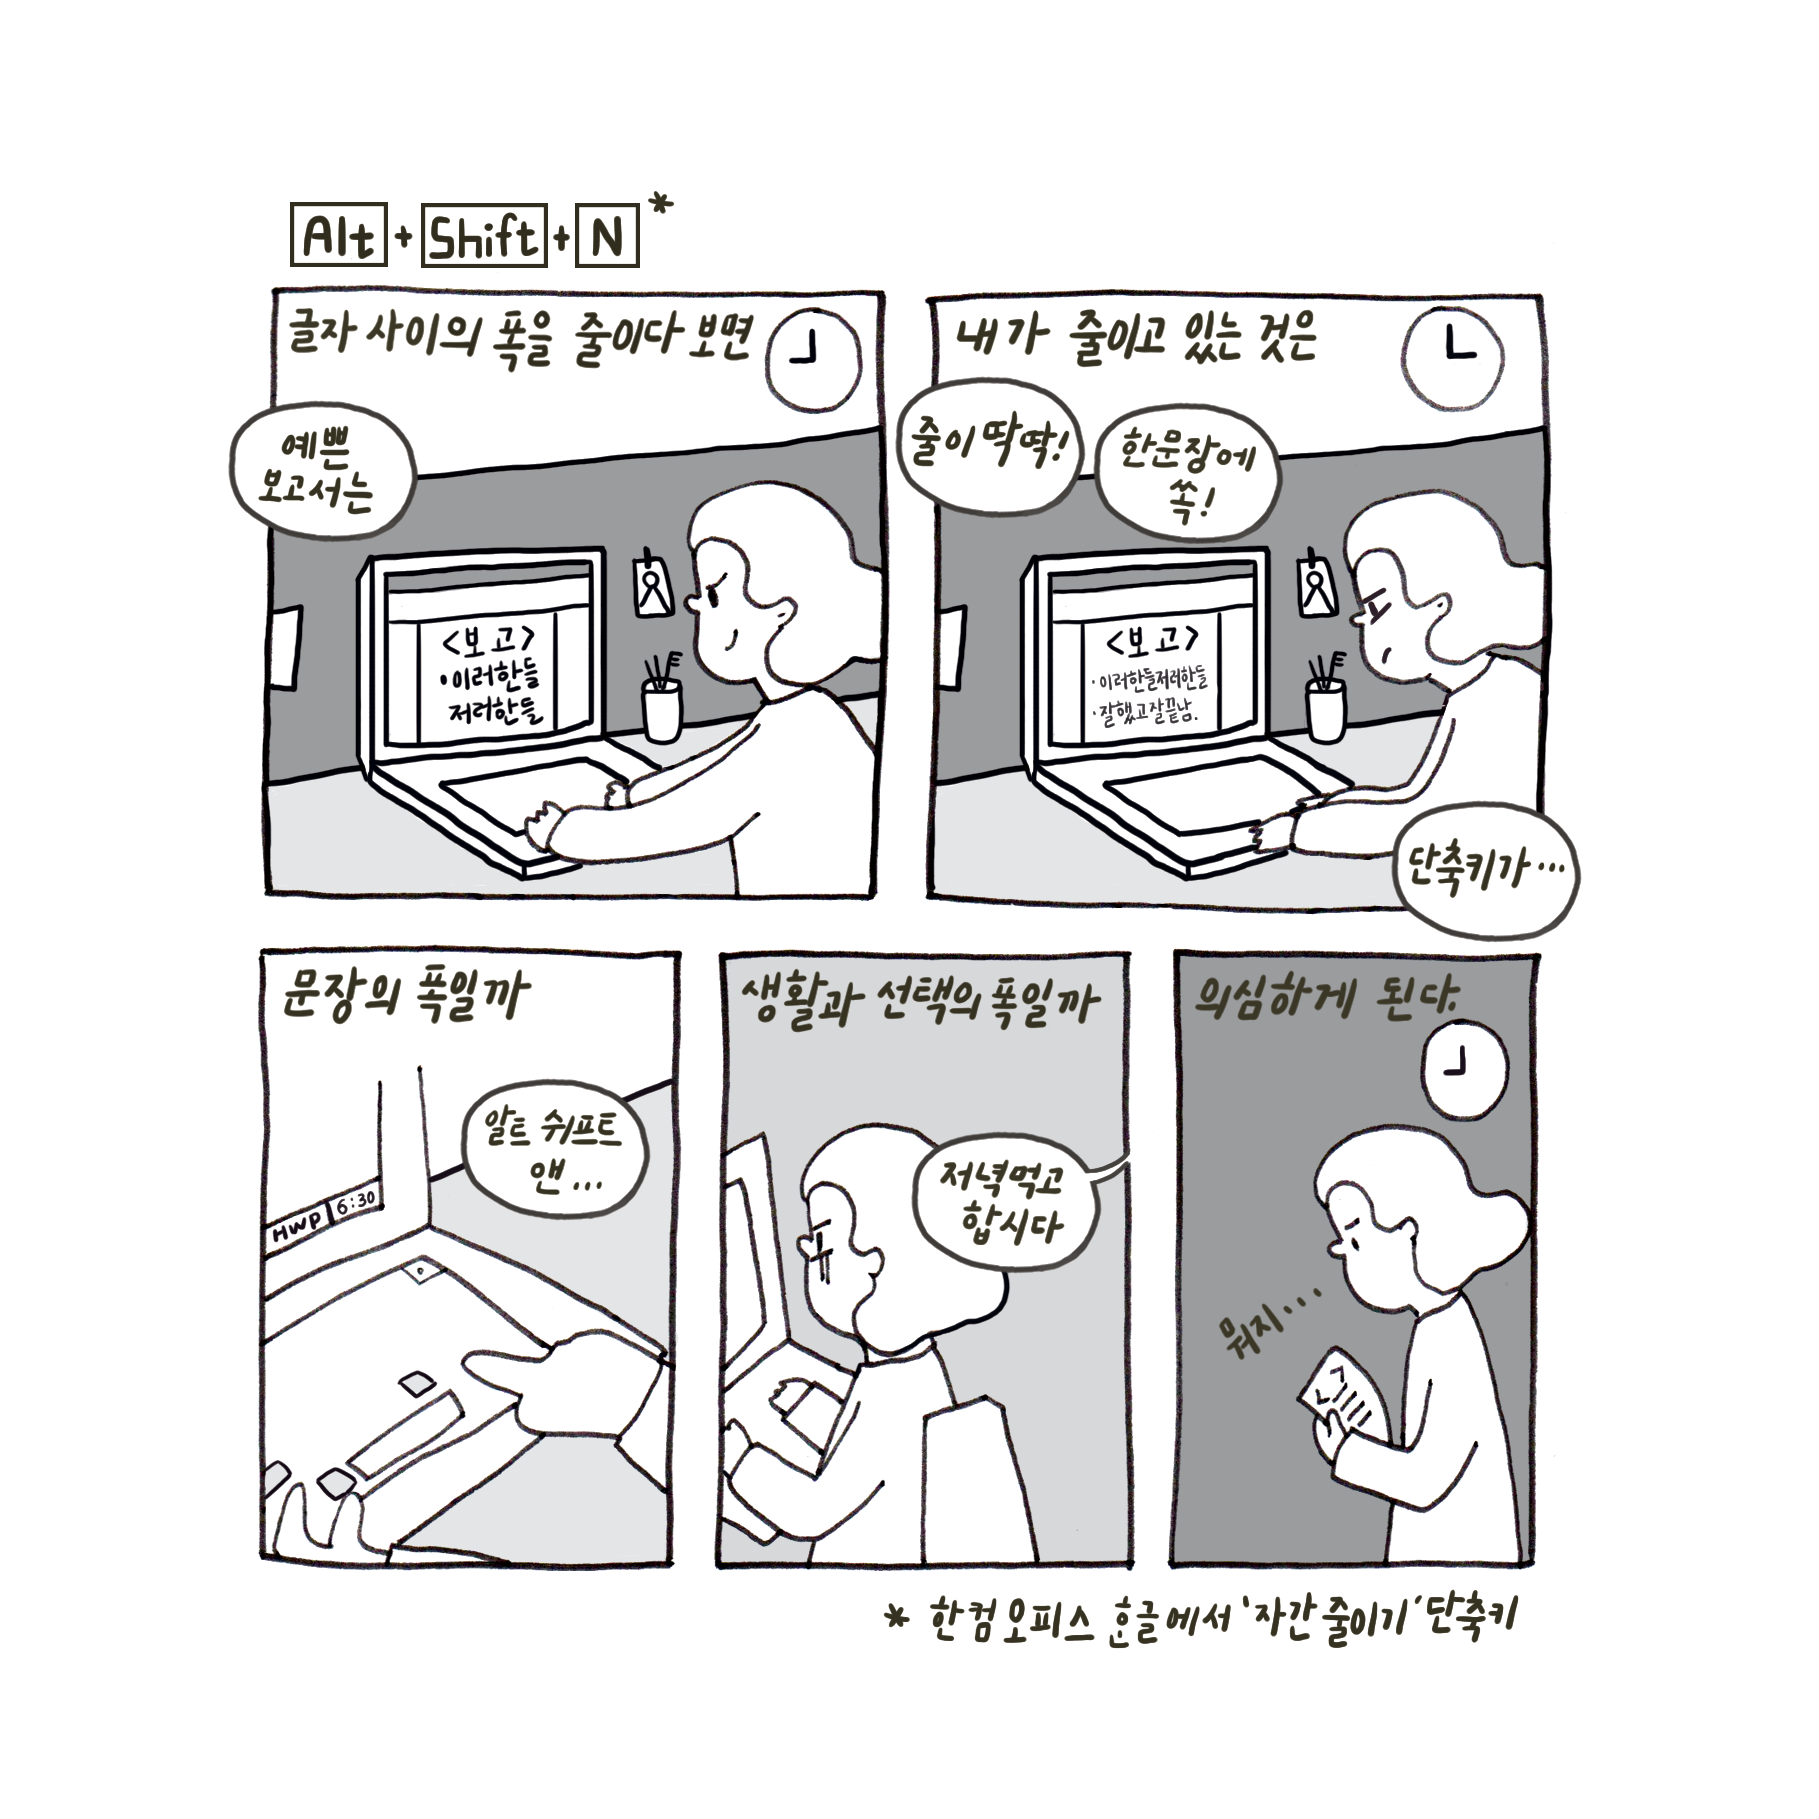 Alt + Shift + N - 안녕히